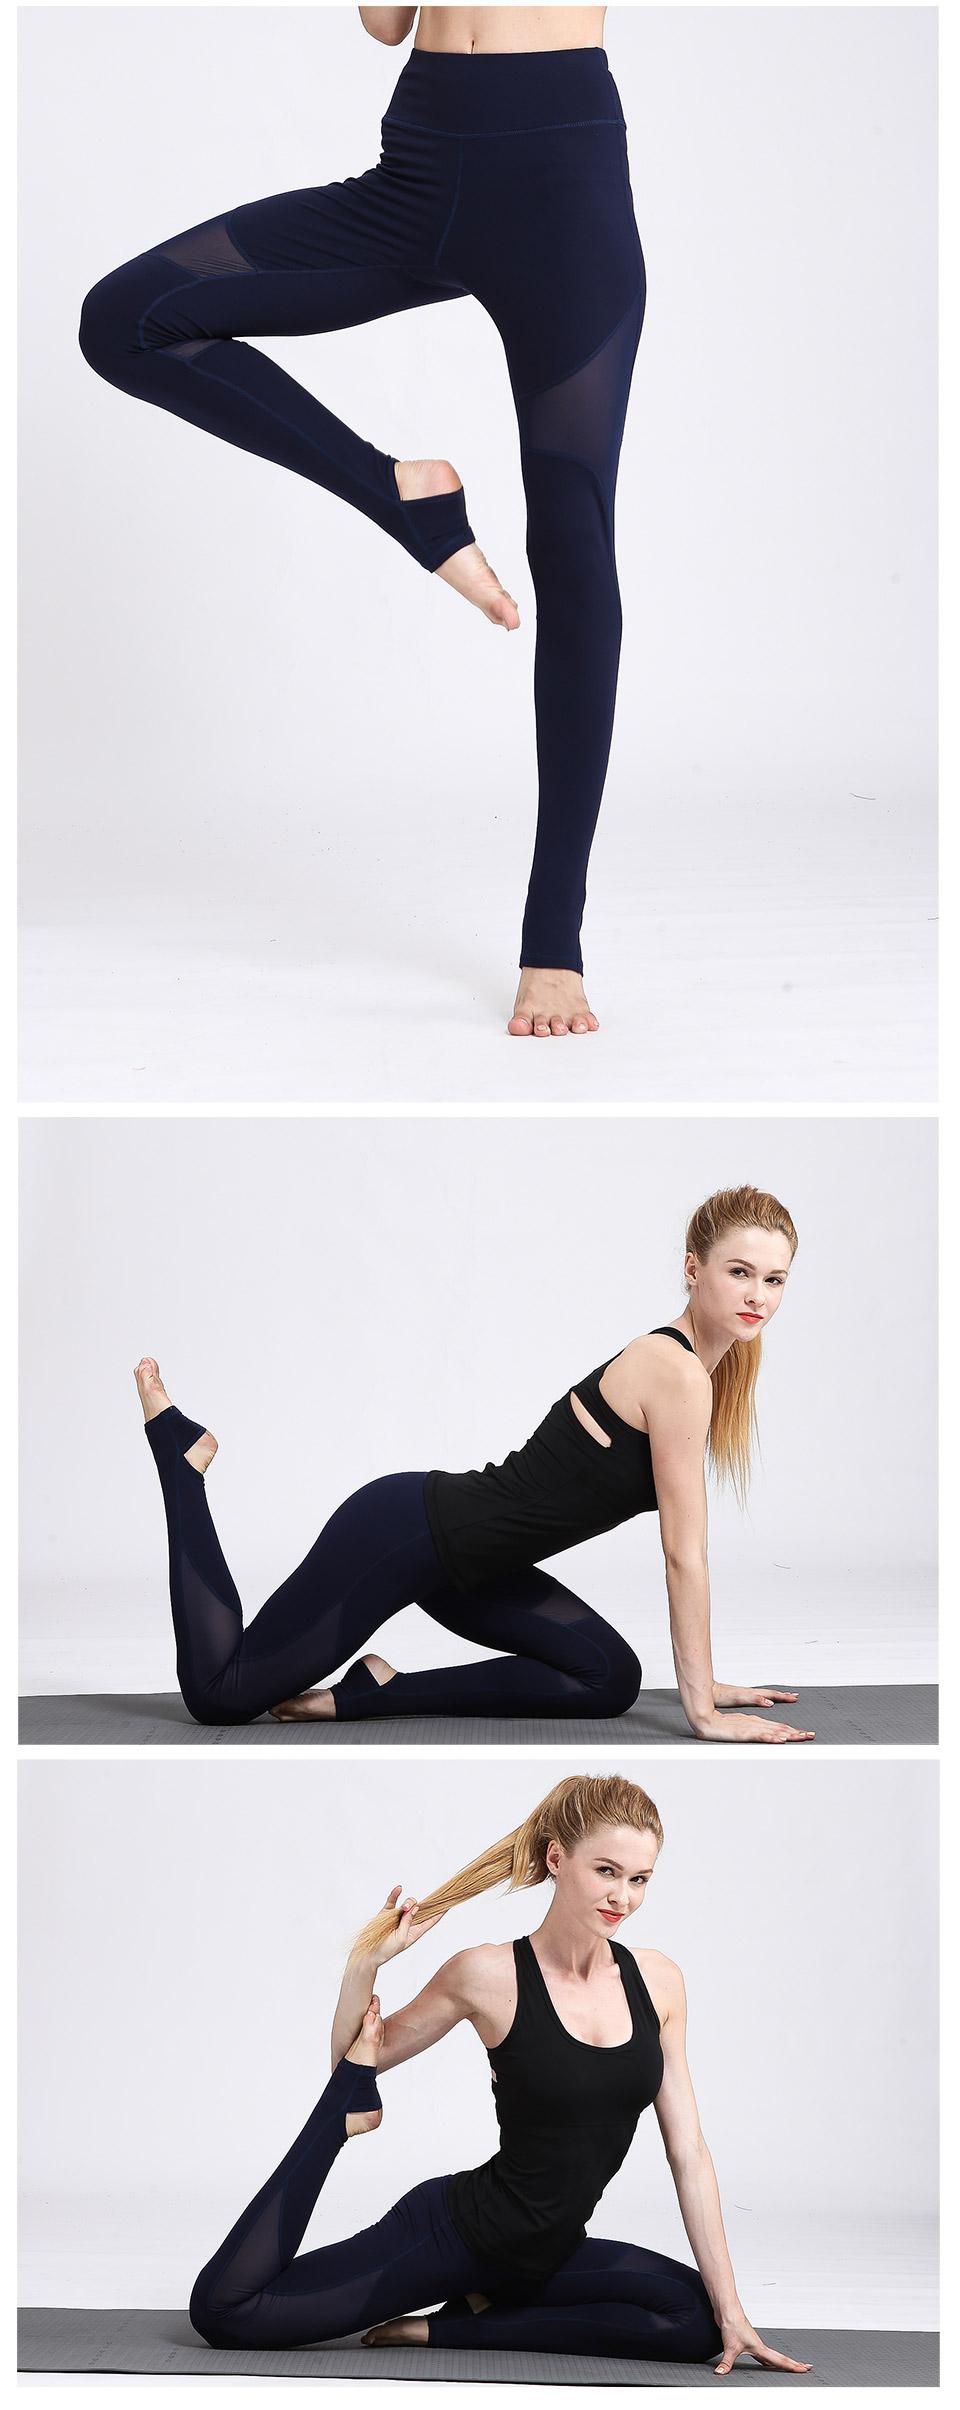 2c6f5eede Compre Calças De Yoga Mulheres Alargar A Dança Da Cintura Leggings ...